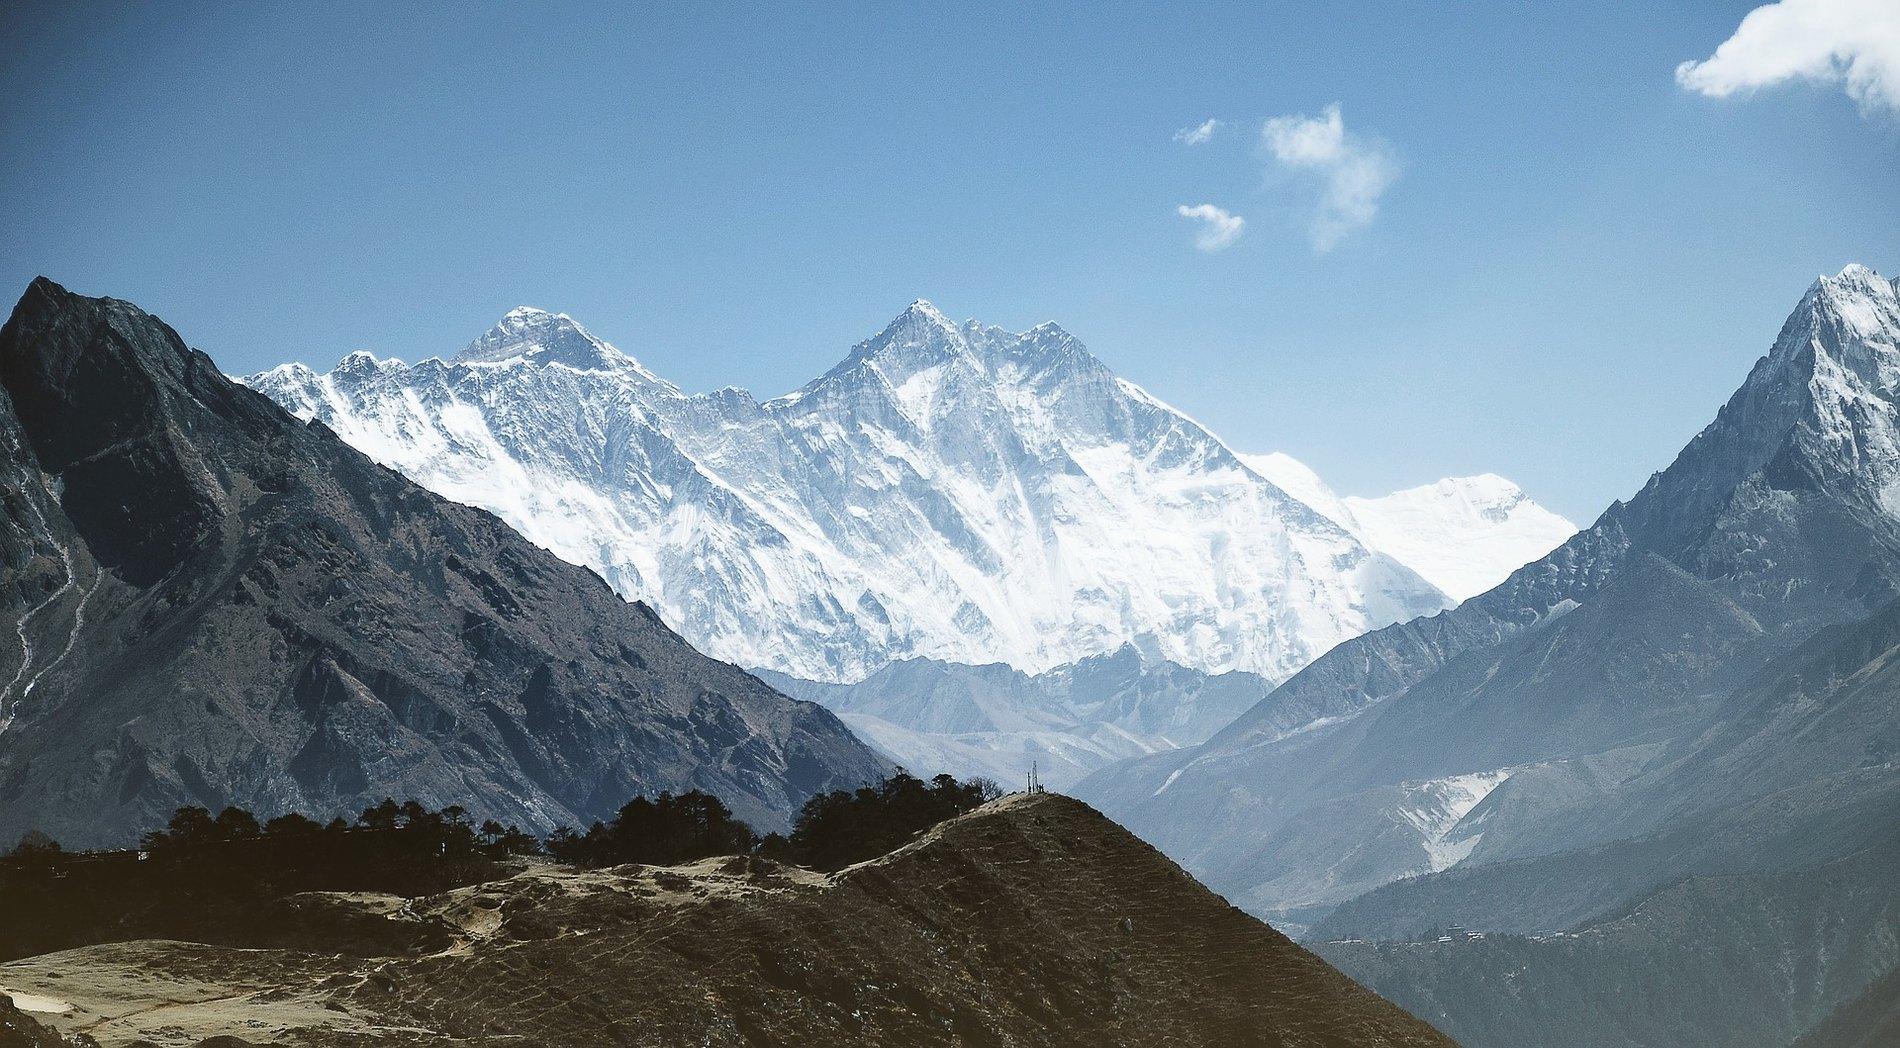 Найвища гора світу Еверест / pixabay